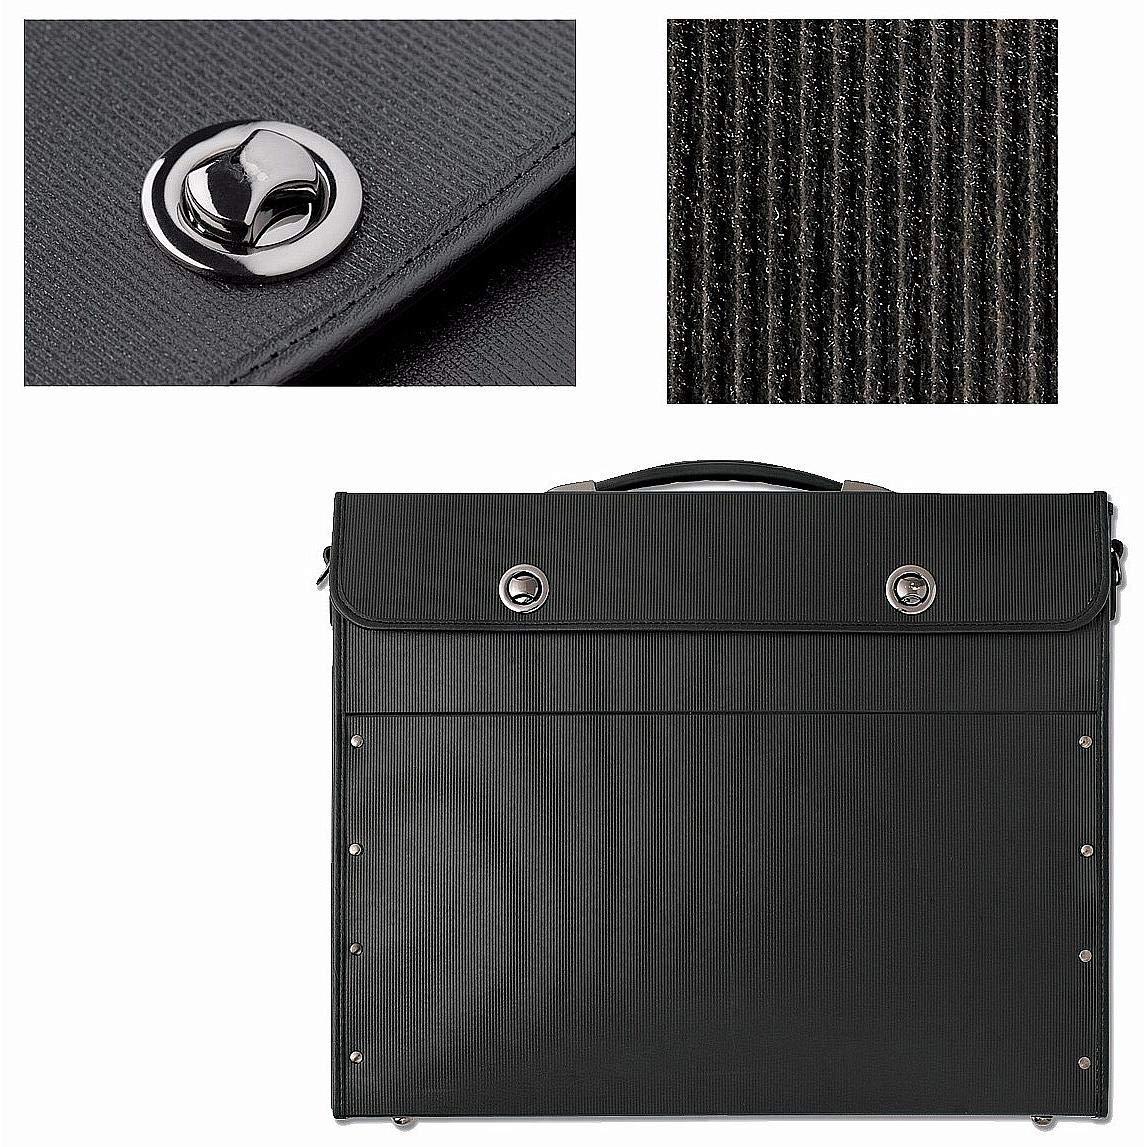 18x14 The START PREMIUM Black Portfolio Bag 18x14x2.50 by Prat-Paris/®